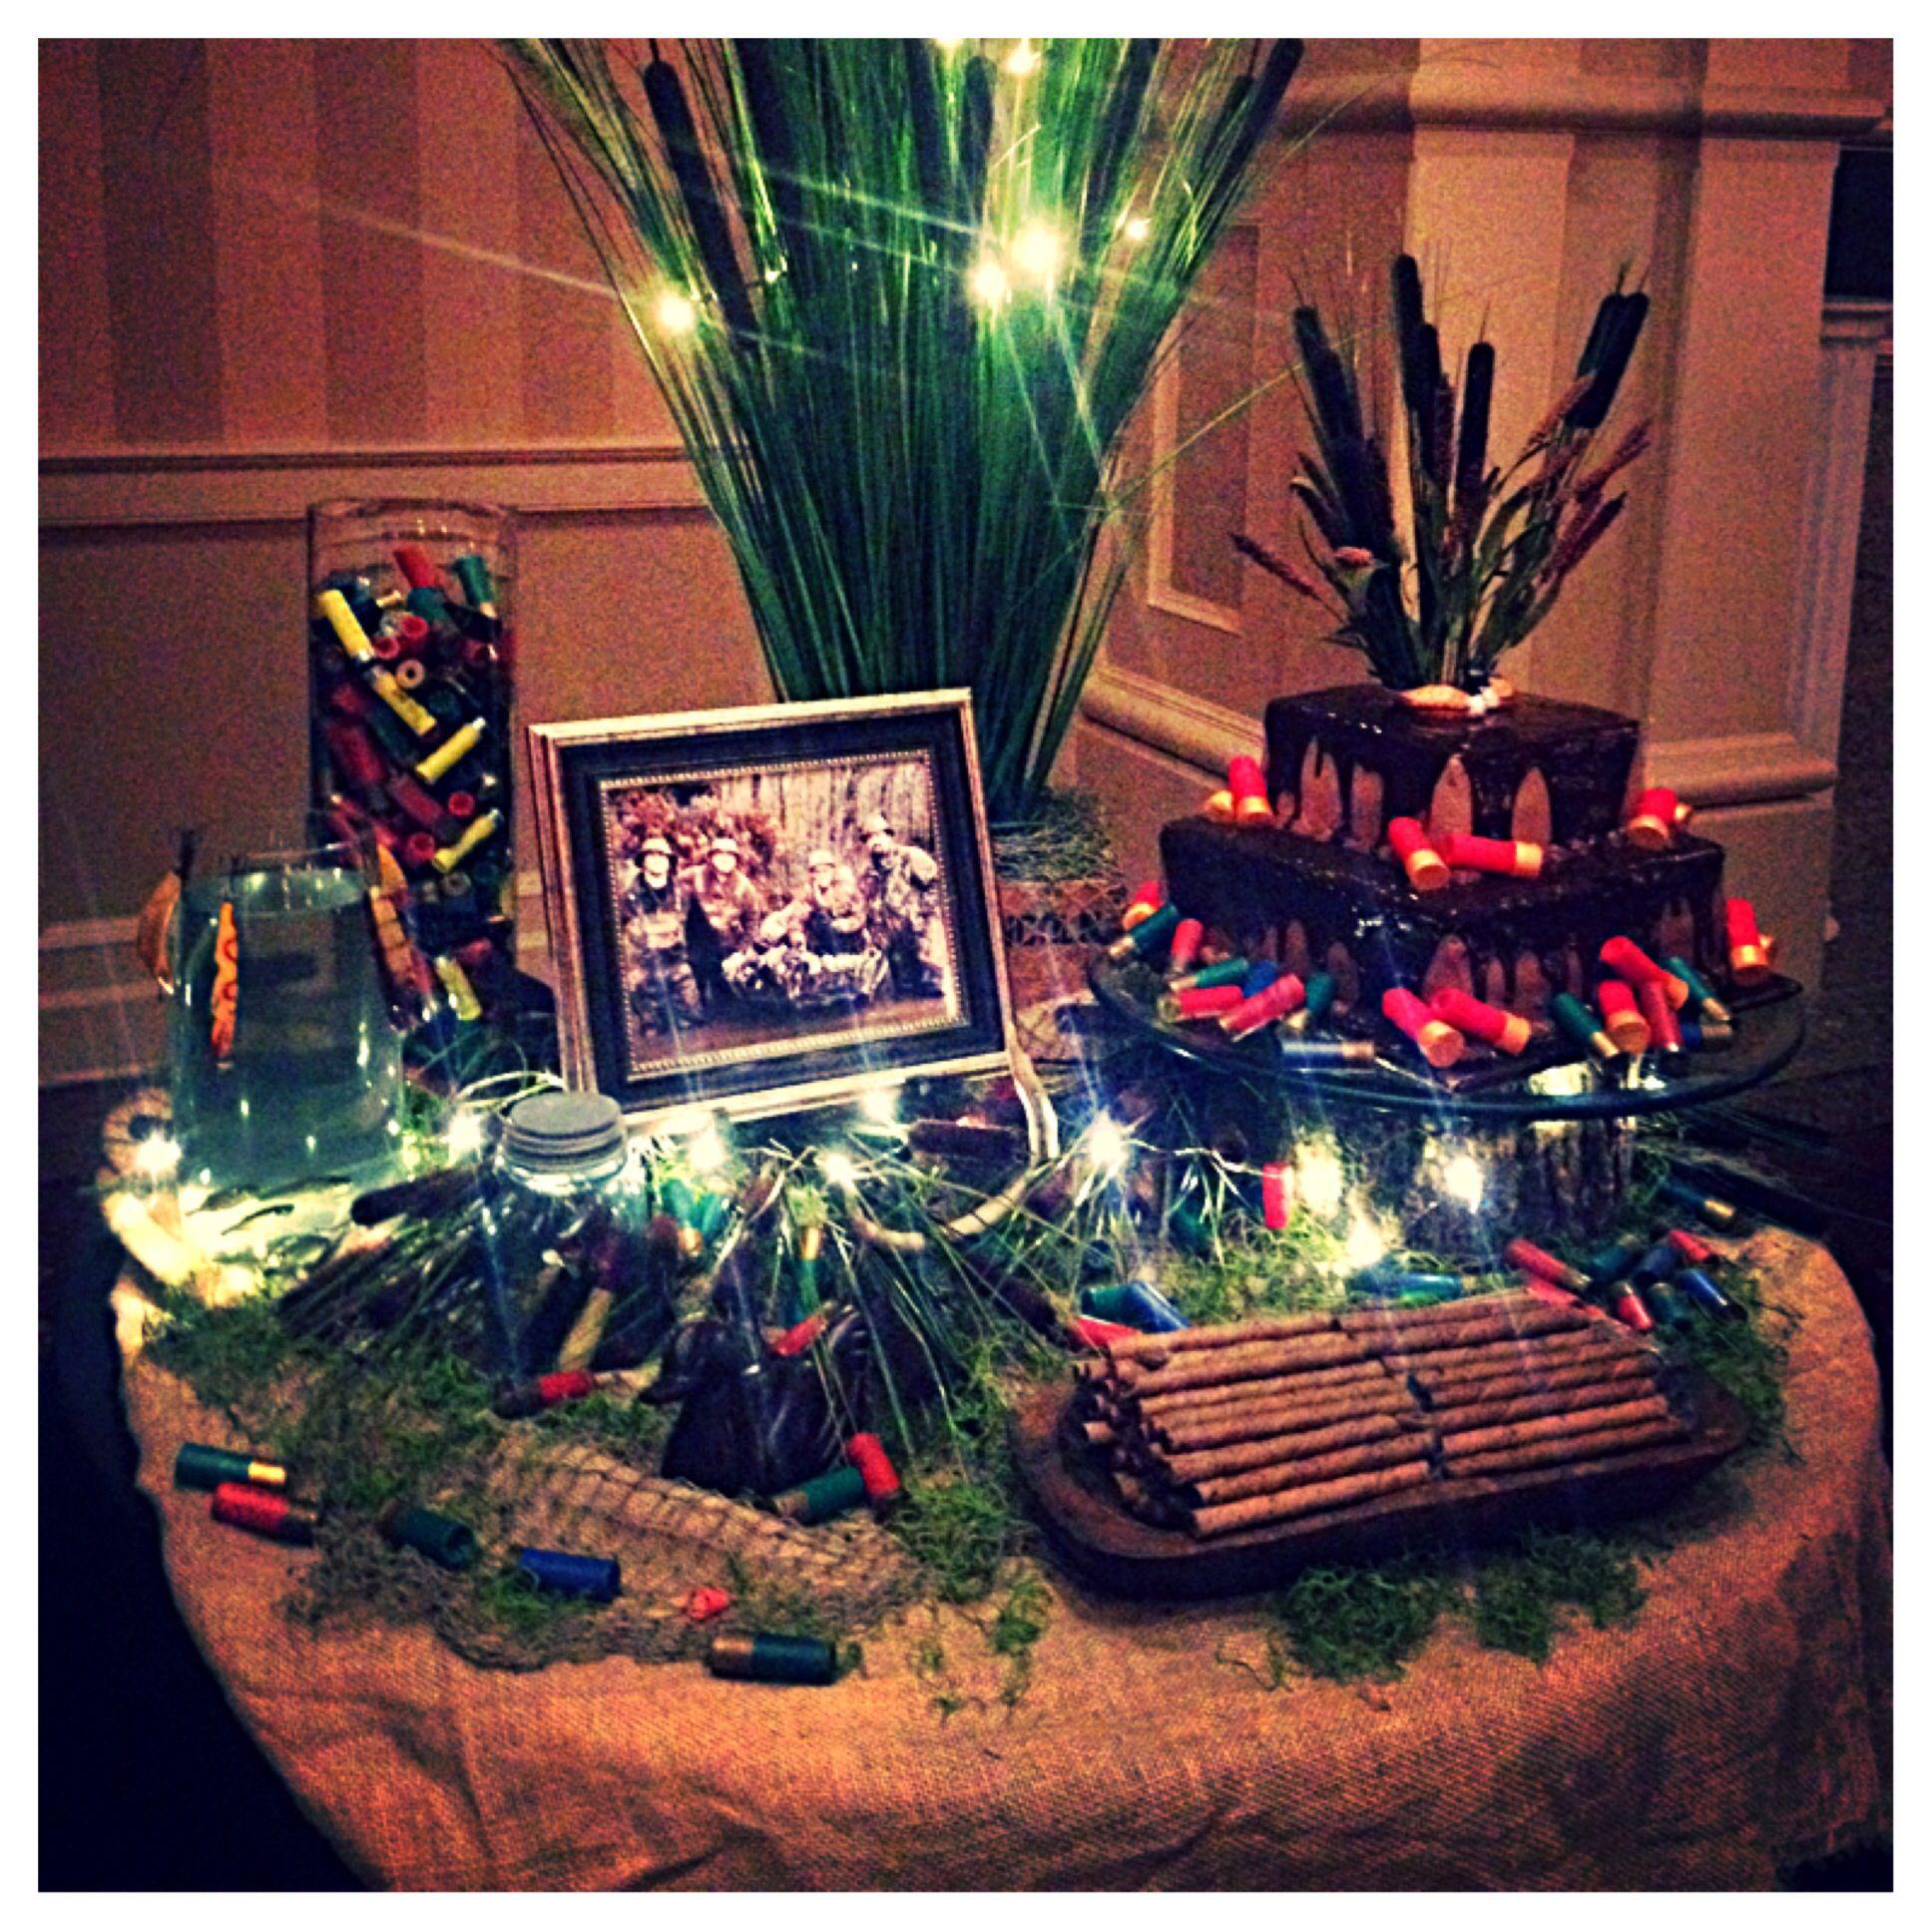 Fishing Wedding Ideas: Groom's Table Hunting Theme- Black Tablecloth, Burlap